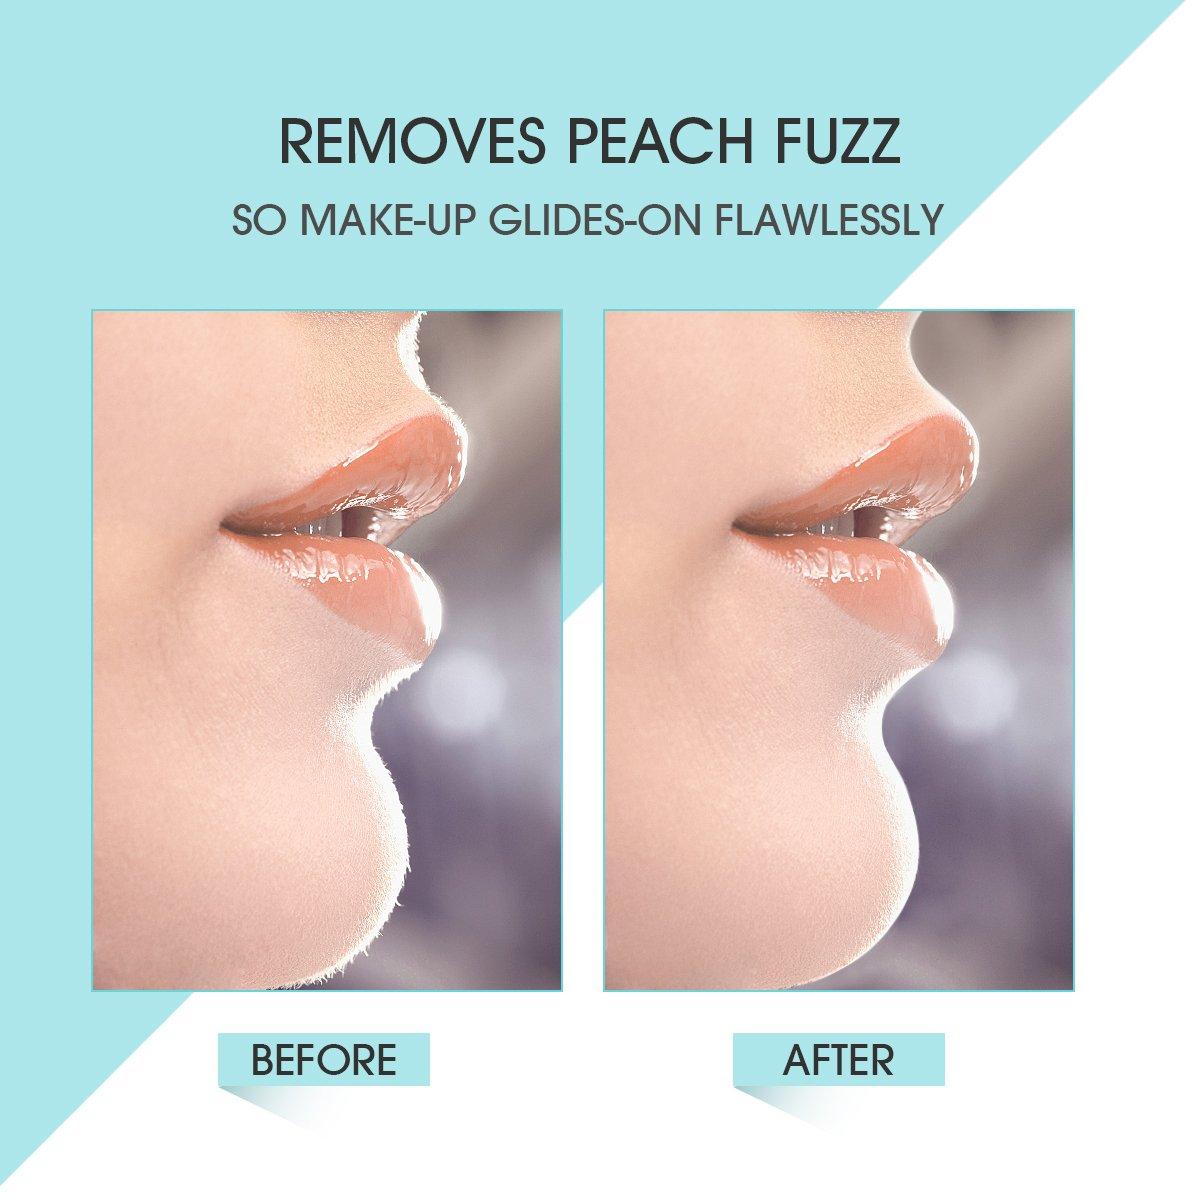 [3 in 1] Hangsun Facial Hair Removal for Women F130 Painless Face Epilator + Electric Eyebrow Trimmer + Bikini Hair Remover Precision Lady Shaver by Hangsun (Image #2)